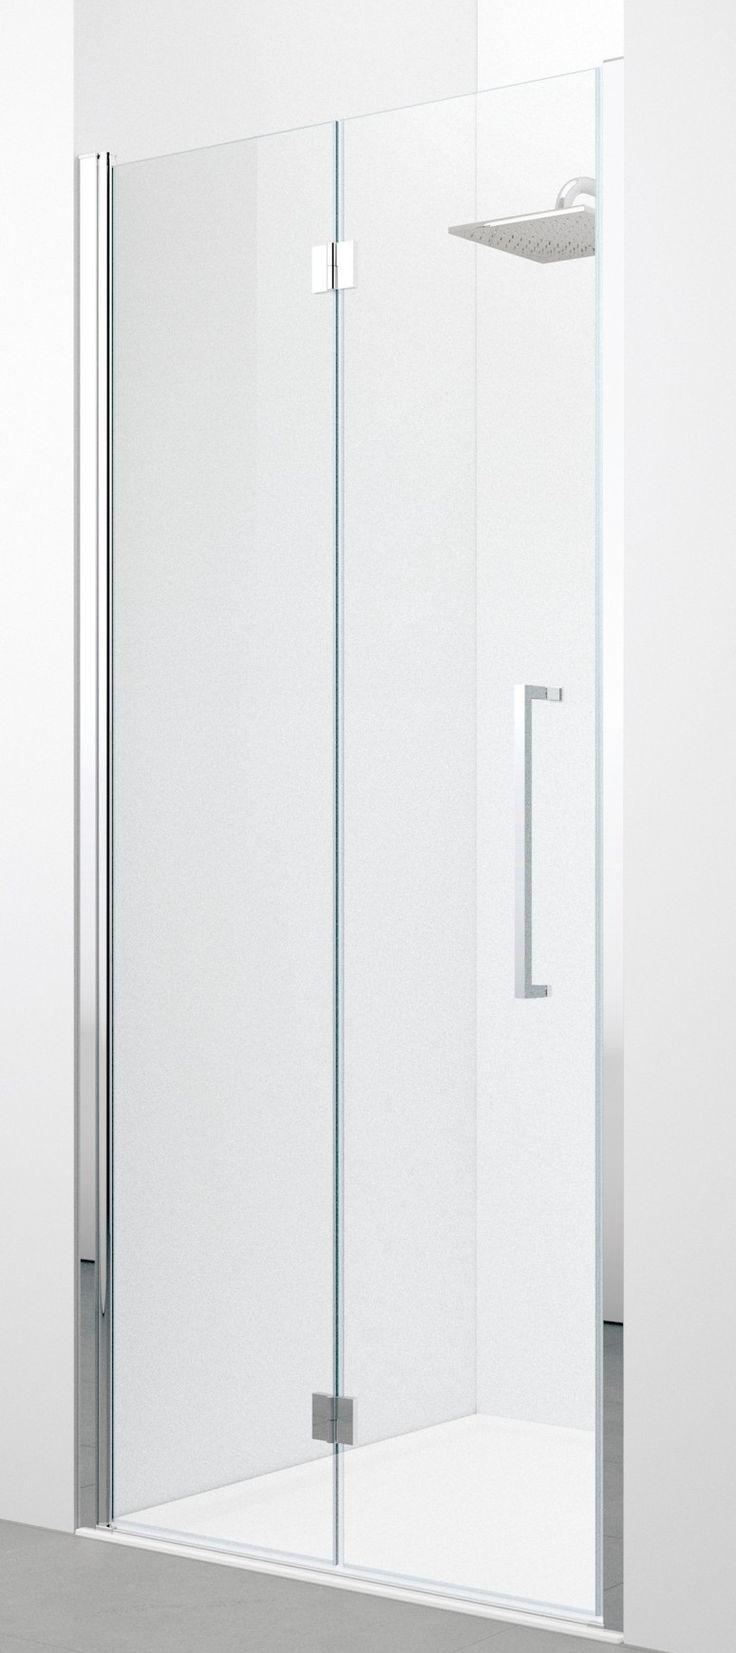 Image result for foldedør dusj